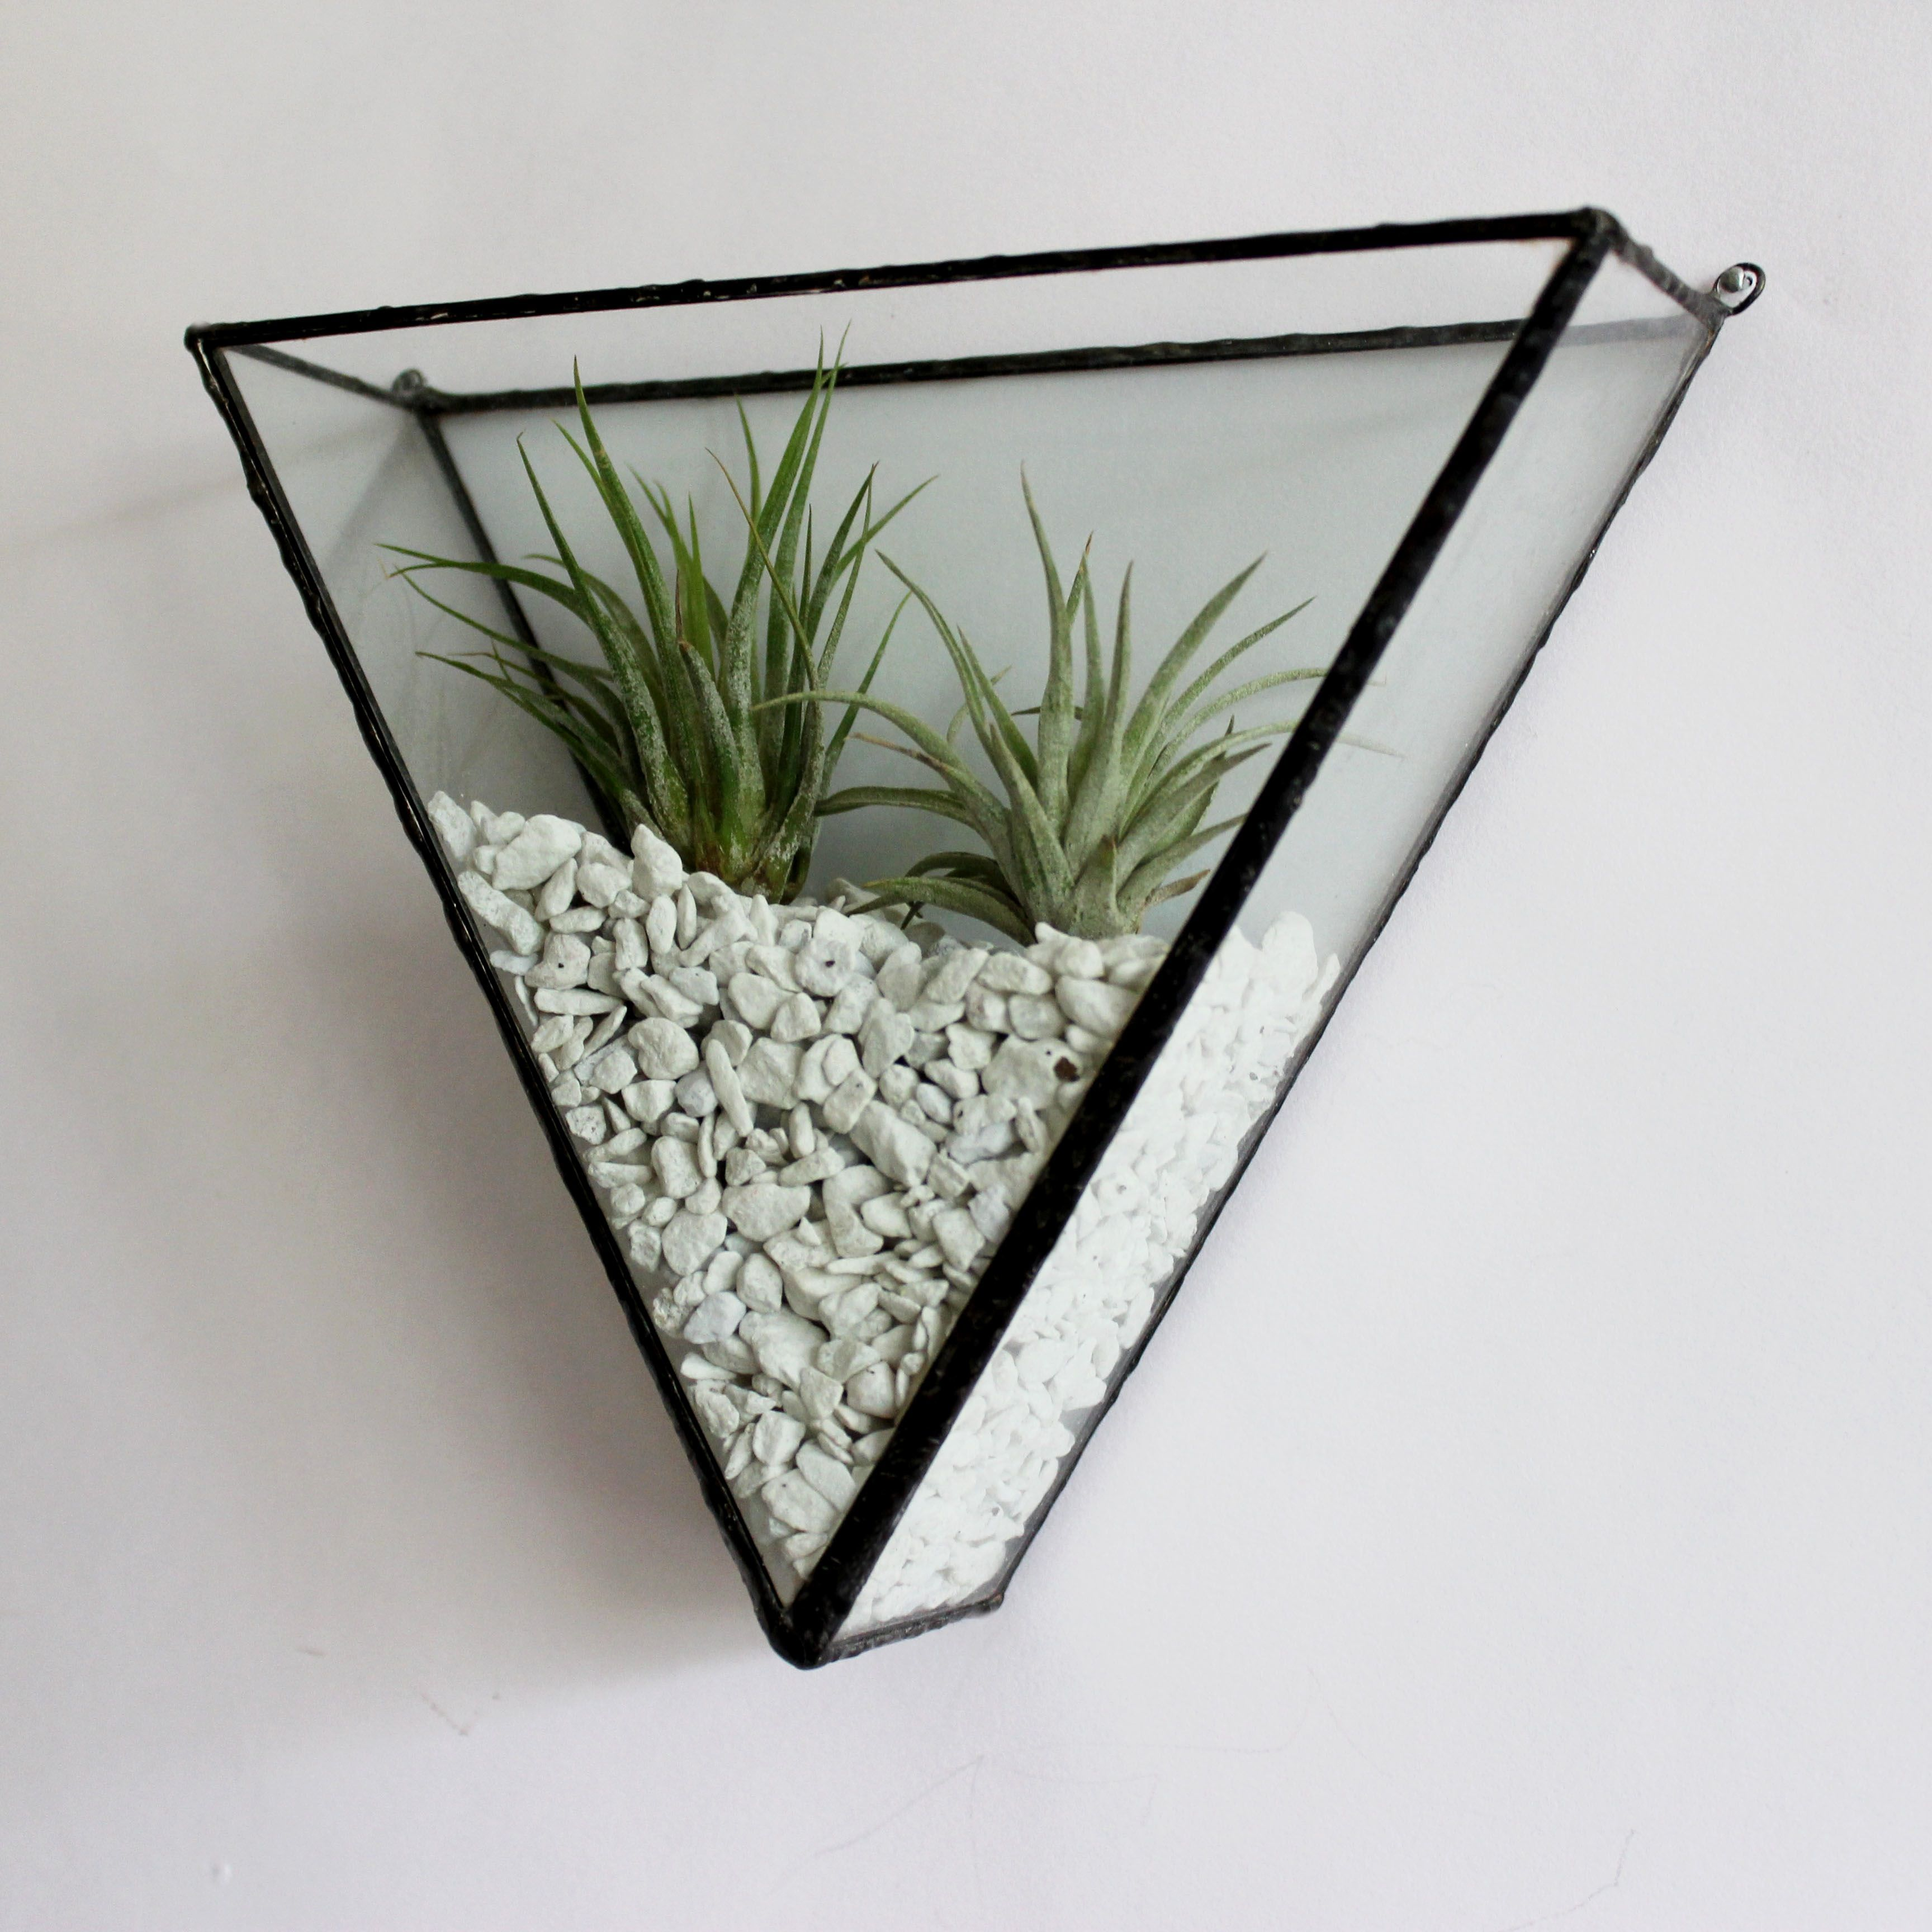 Ada Triangle Glass Wall Mount Air Plants Decor Plant Decor Plant Wall